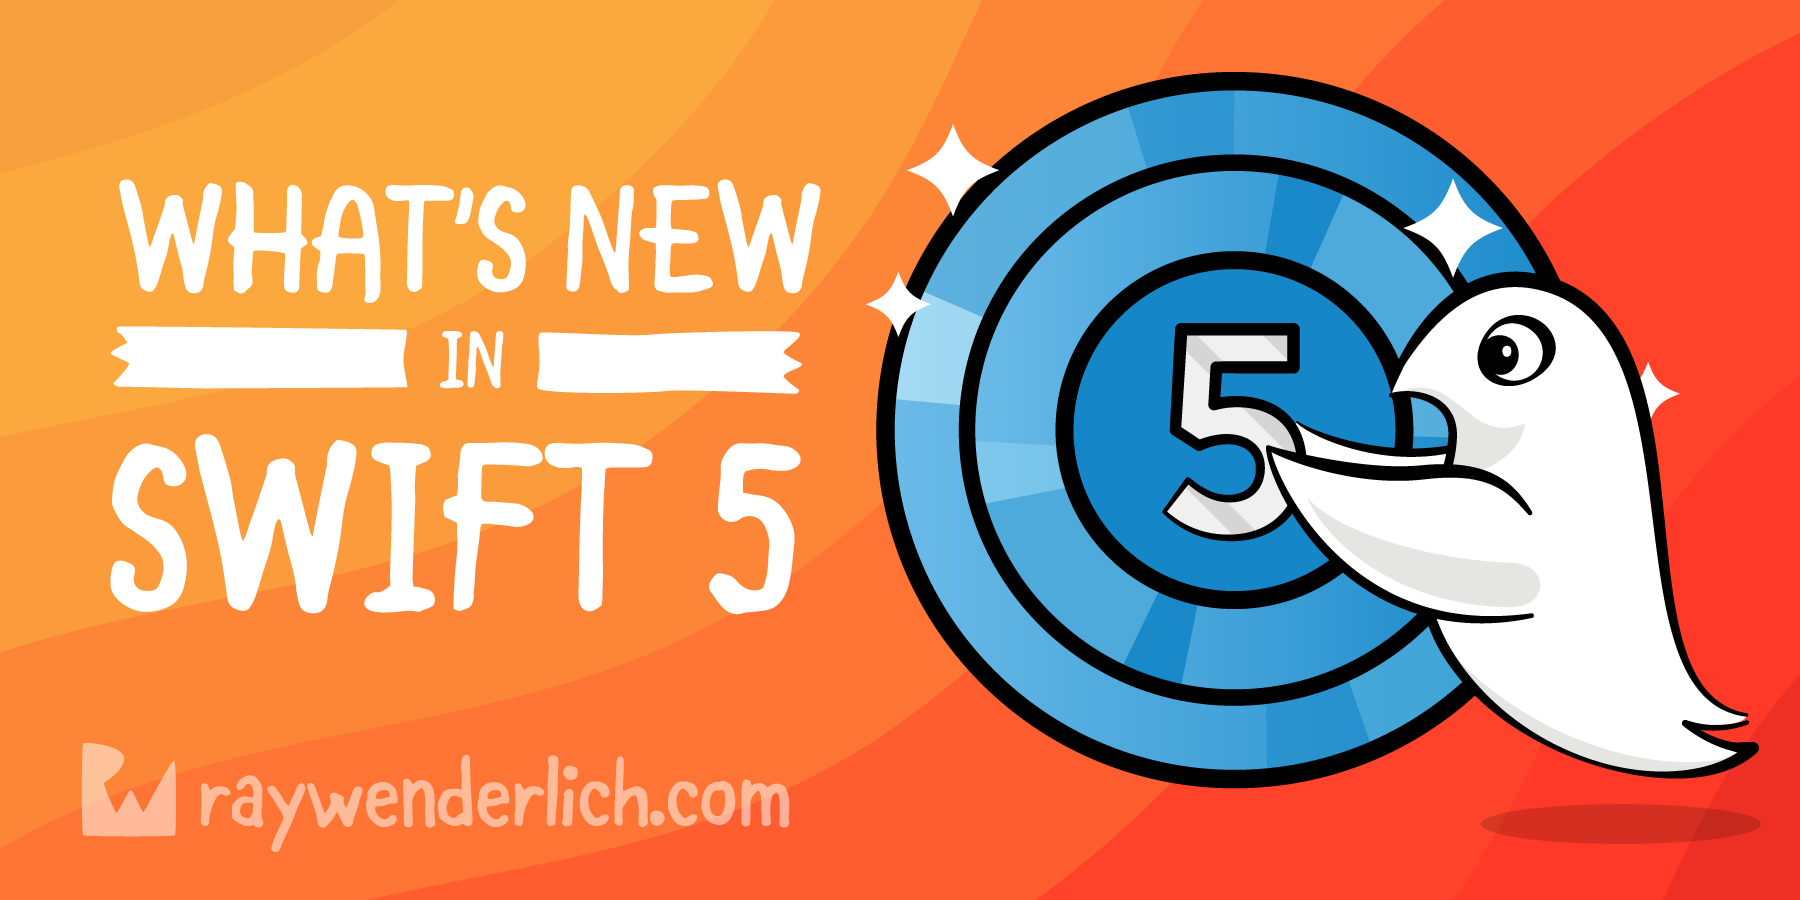 What's New in Swift 5? | raywenderlich com